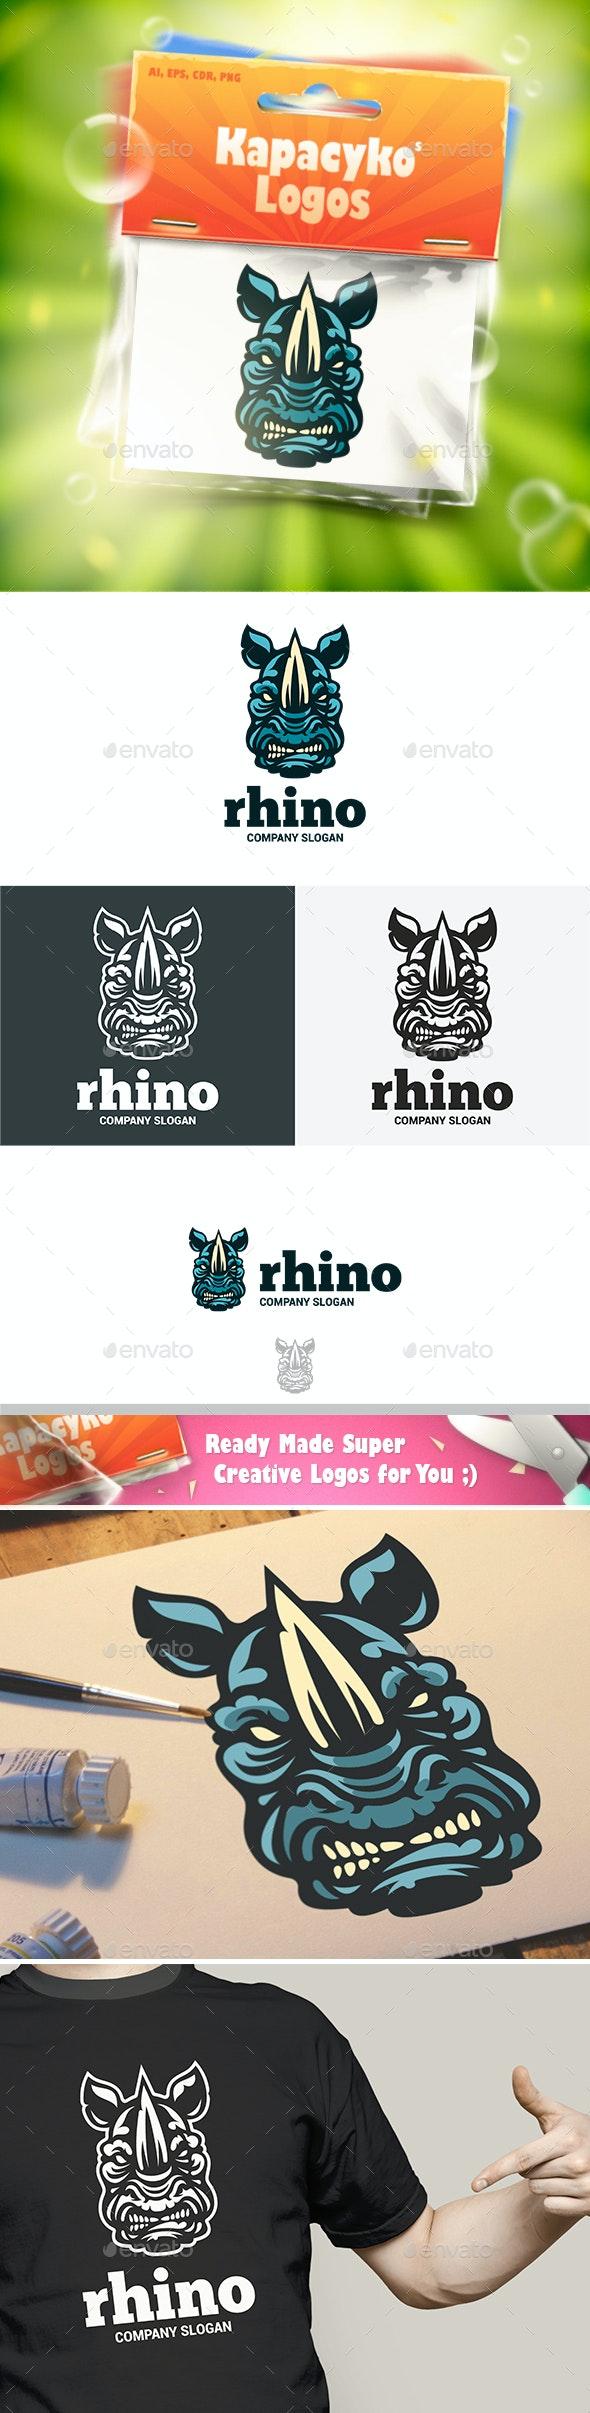 Rhino Logo - Animals Logo Templates